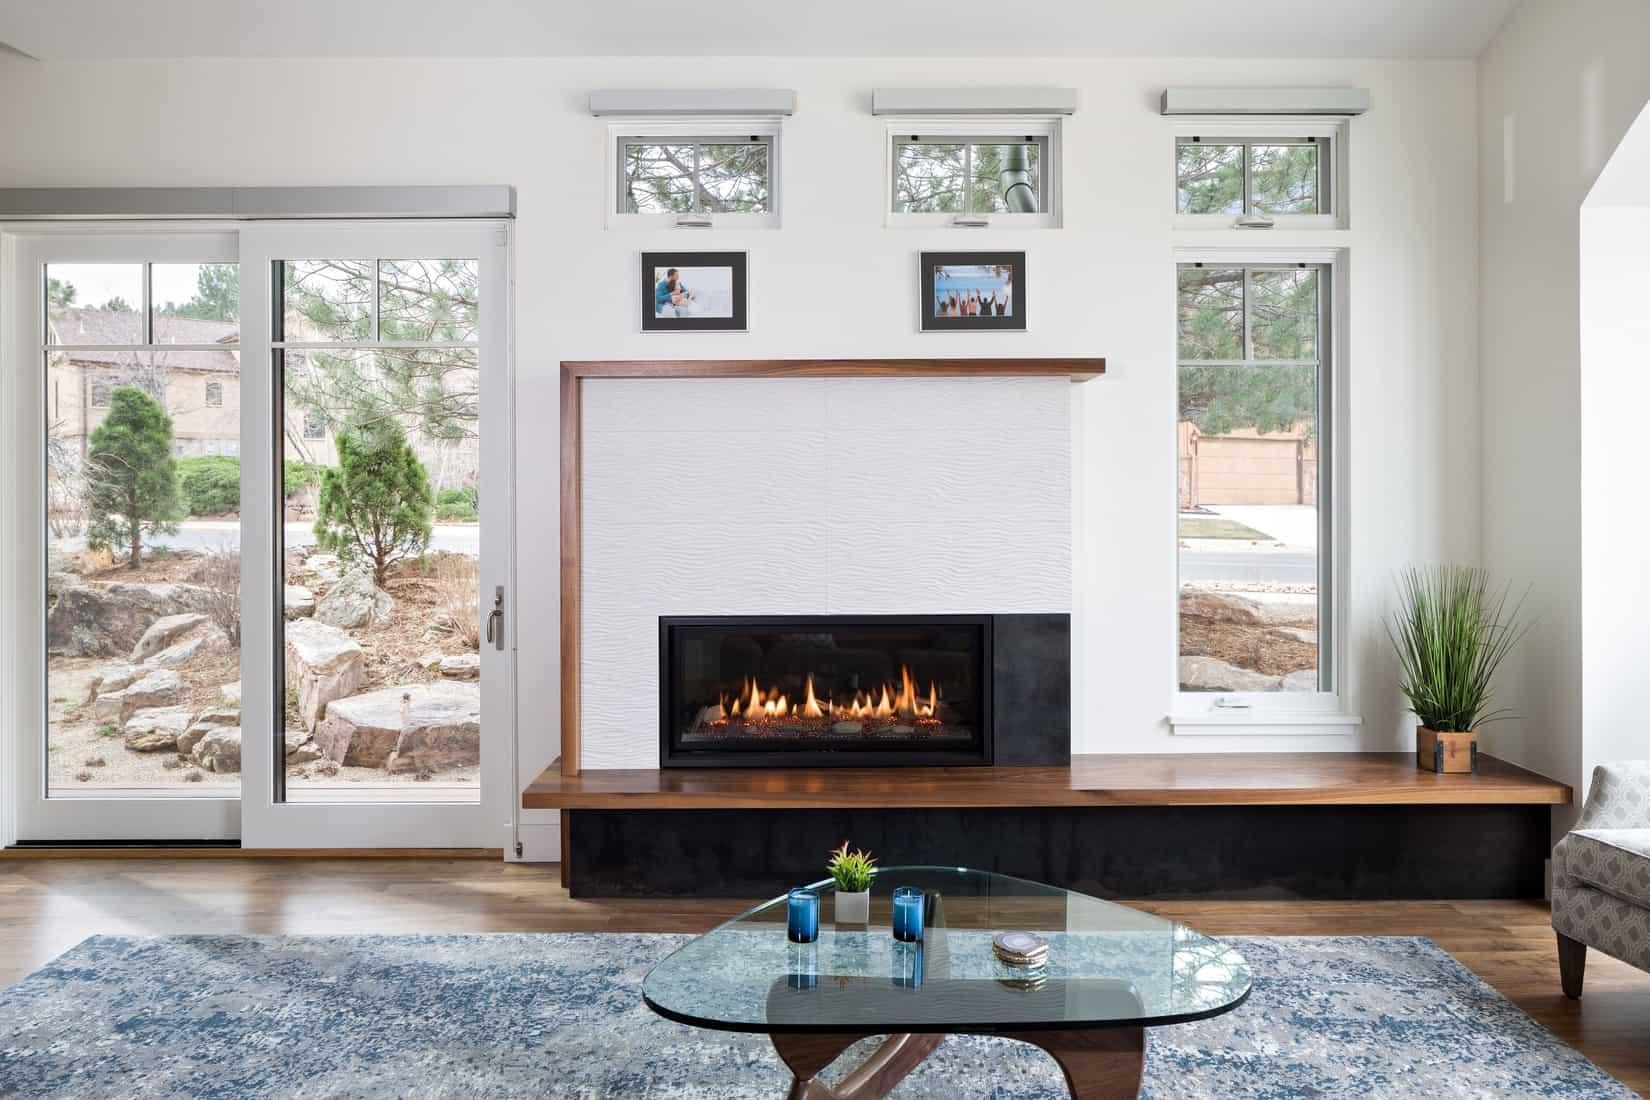 Devil's Thumb Boulder Remodel - Fireplace and Living Room